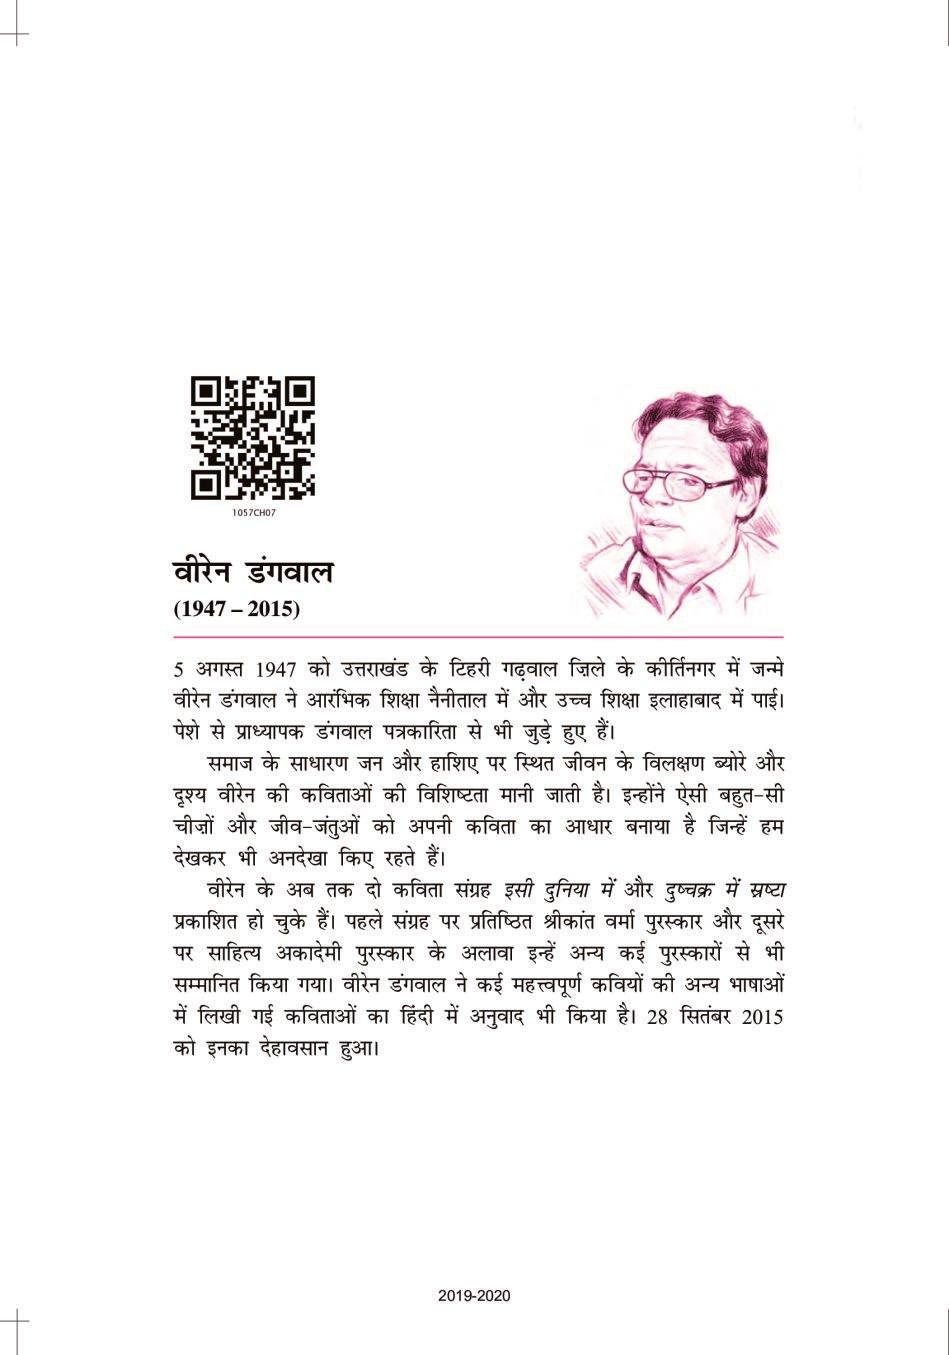 NCERT Book Class 10 Hindi (स्पर्श) Chapter 7 तोप - Page 1